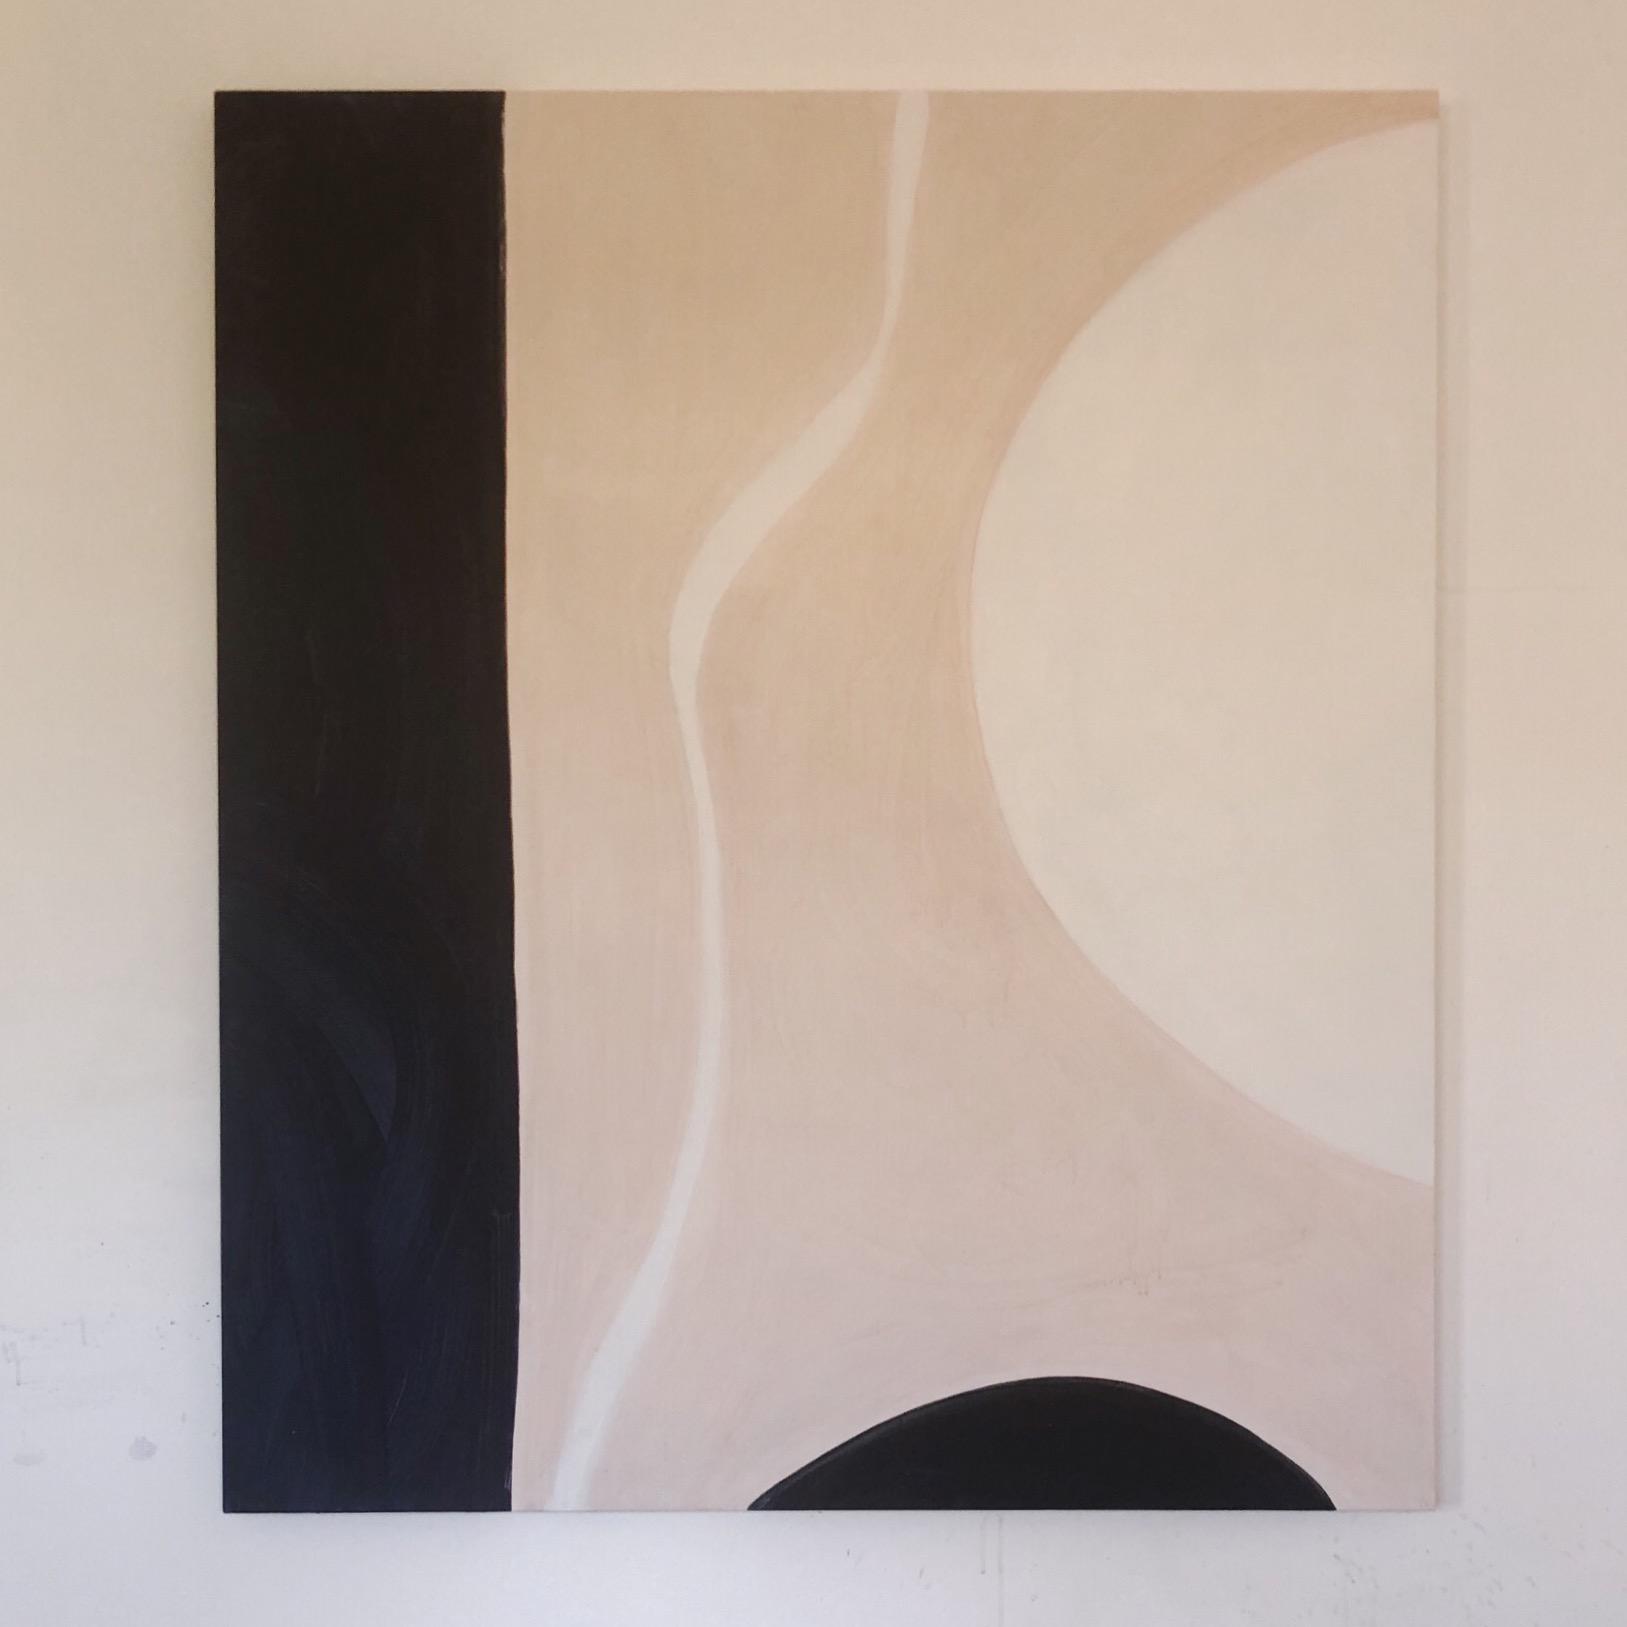 Orbit 2018 140 x 120cm Acrylic and emulsion on canvas